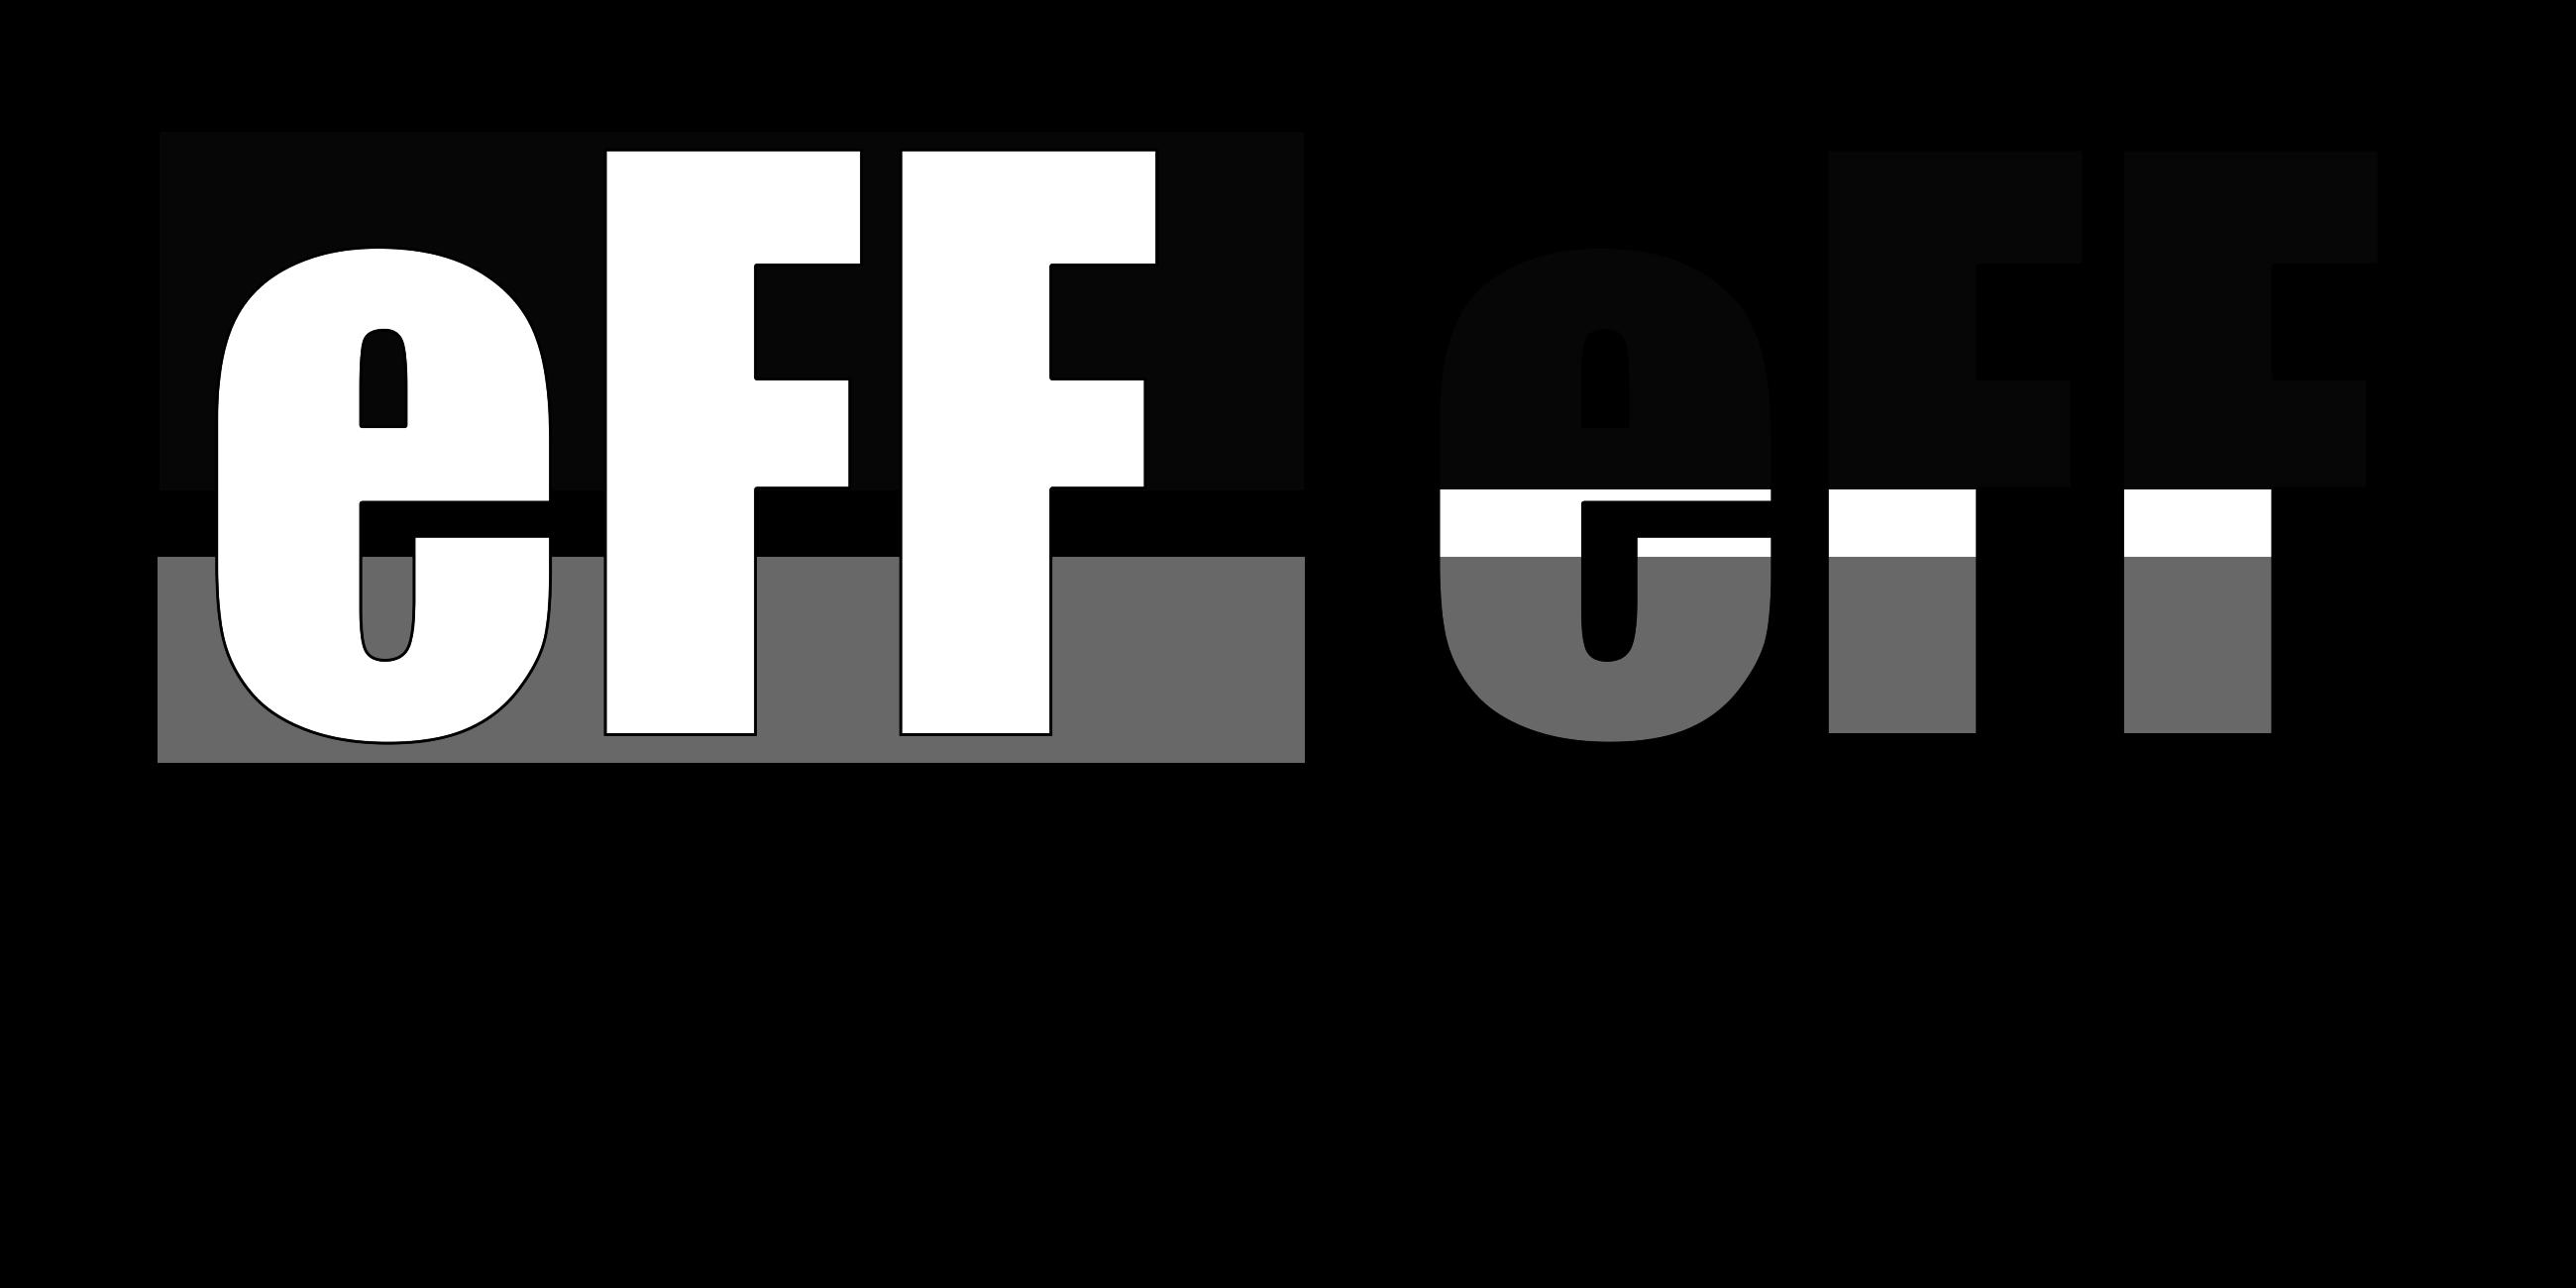 effeff-Group